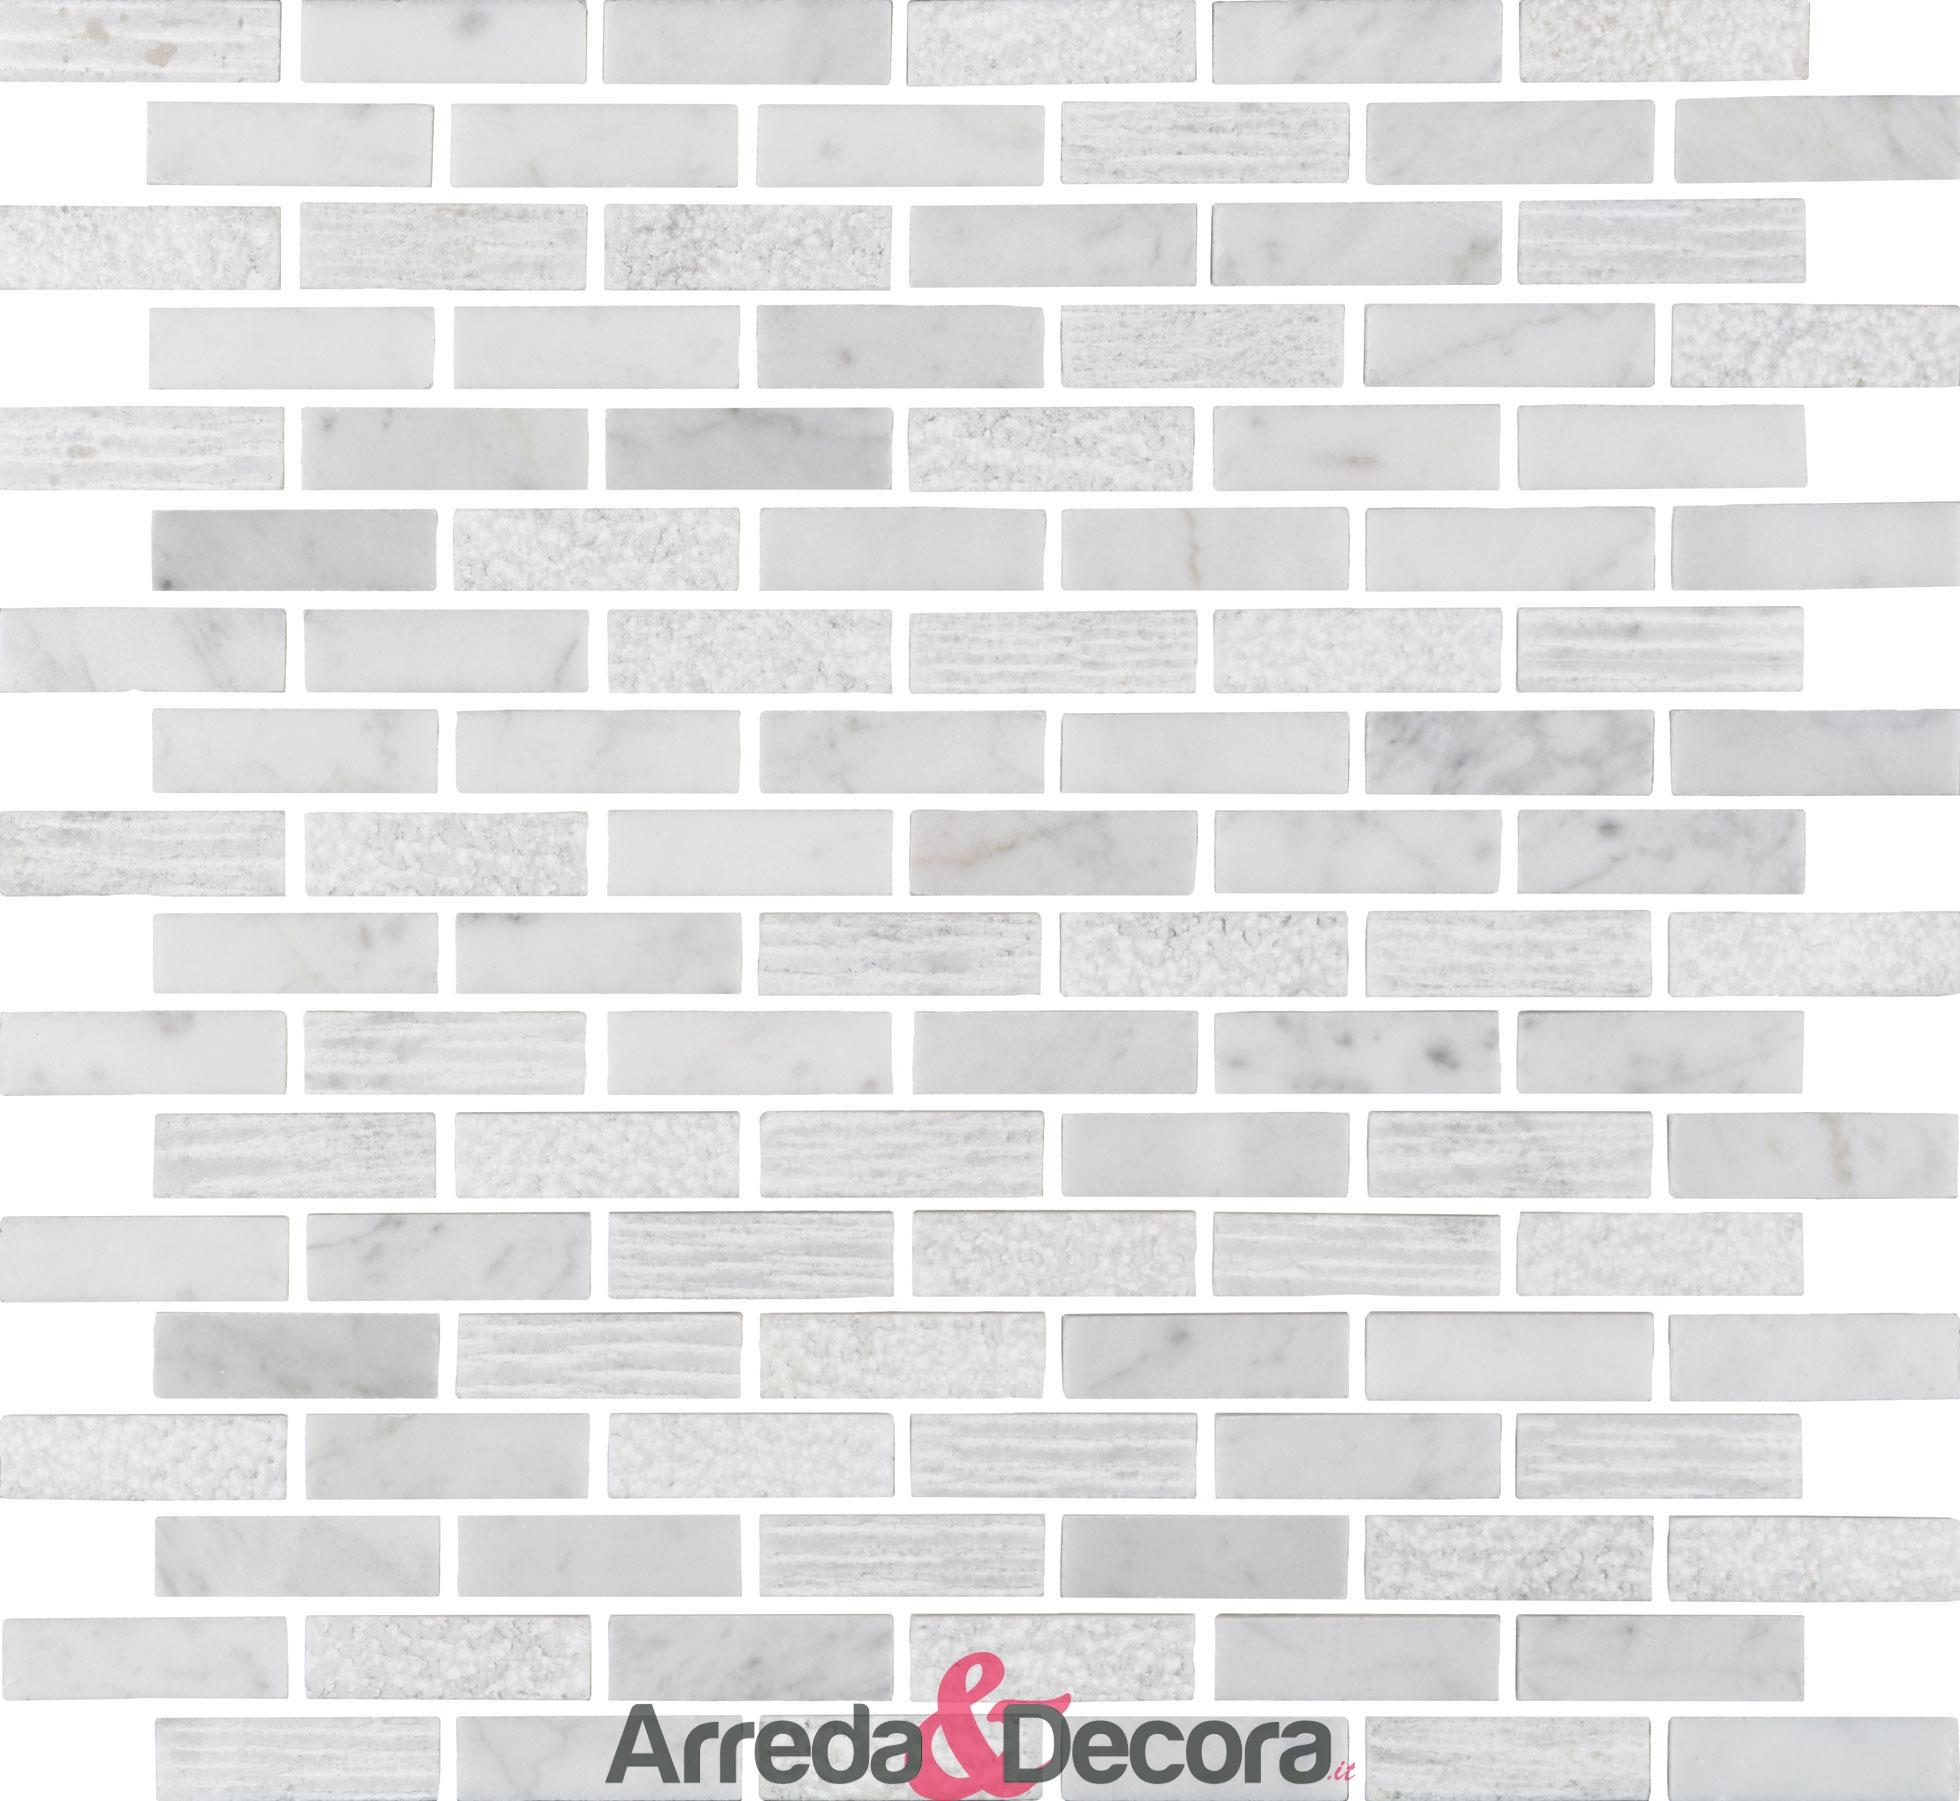 mosaico-travertino-spaccapietra